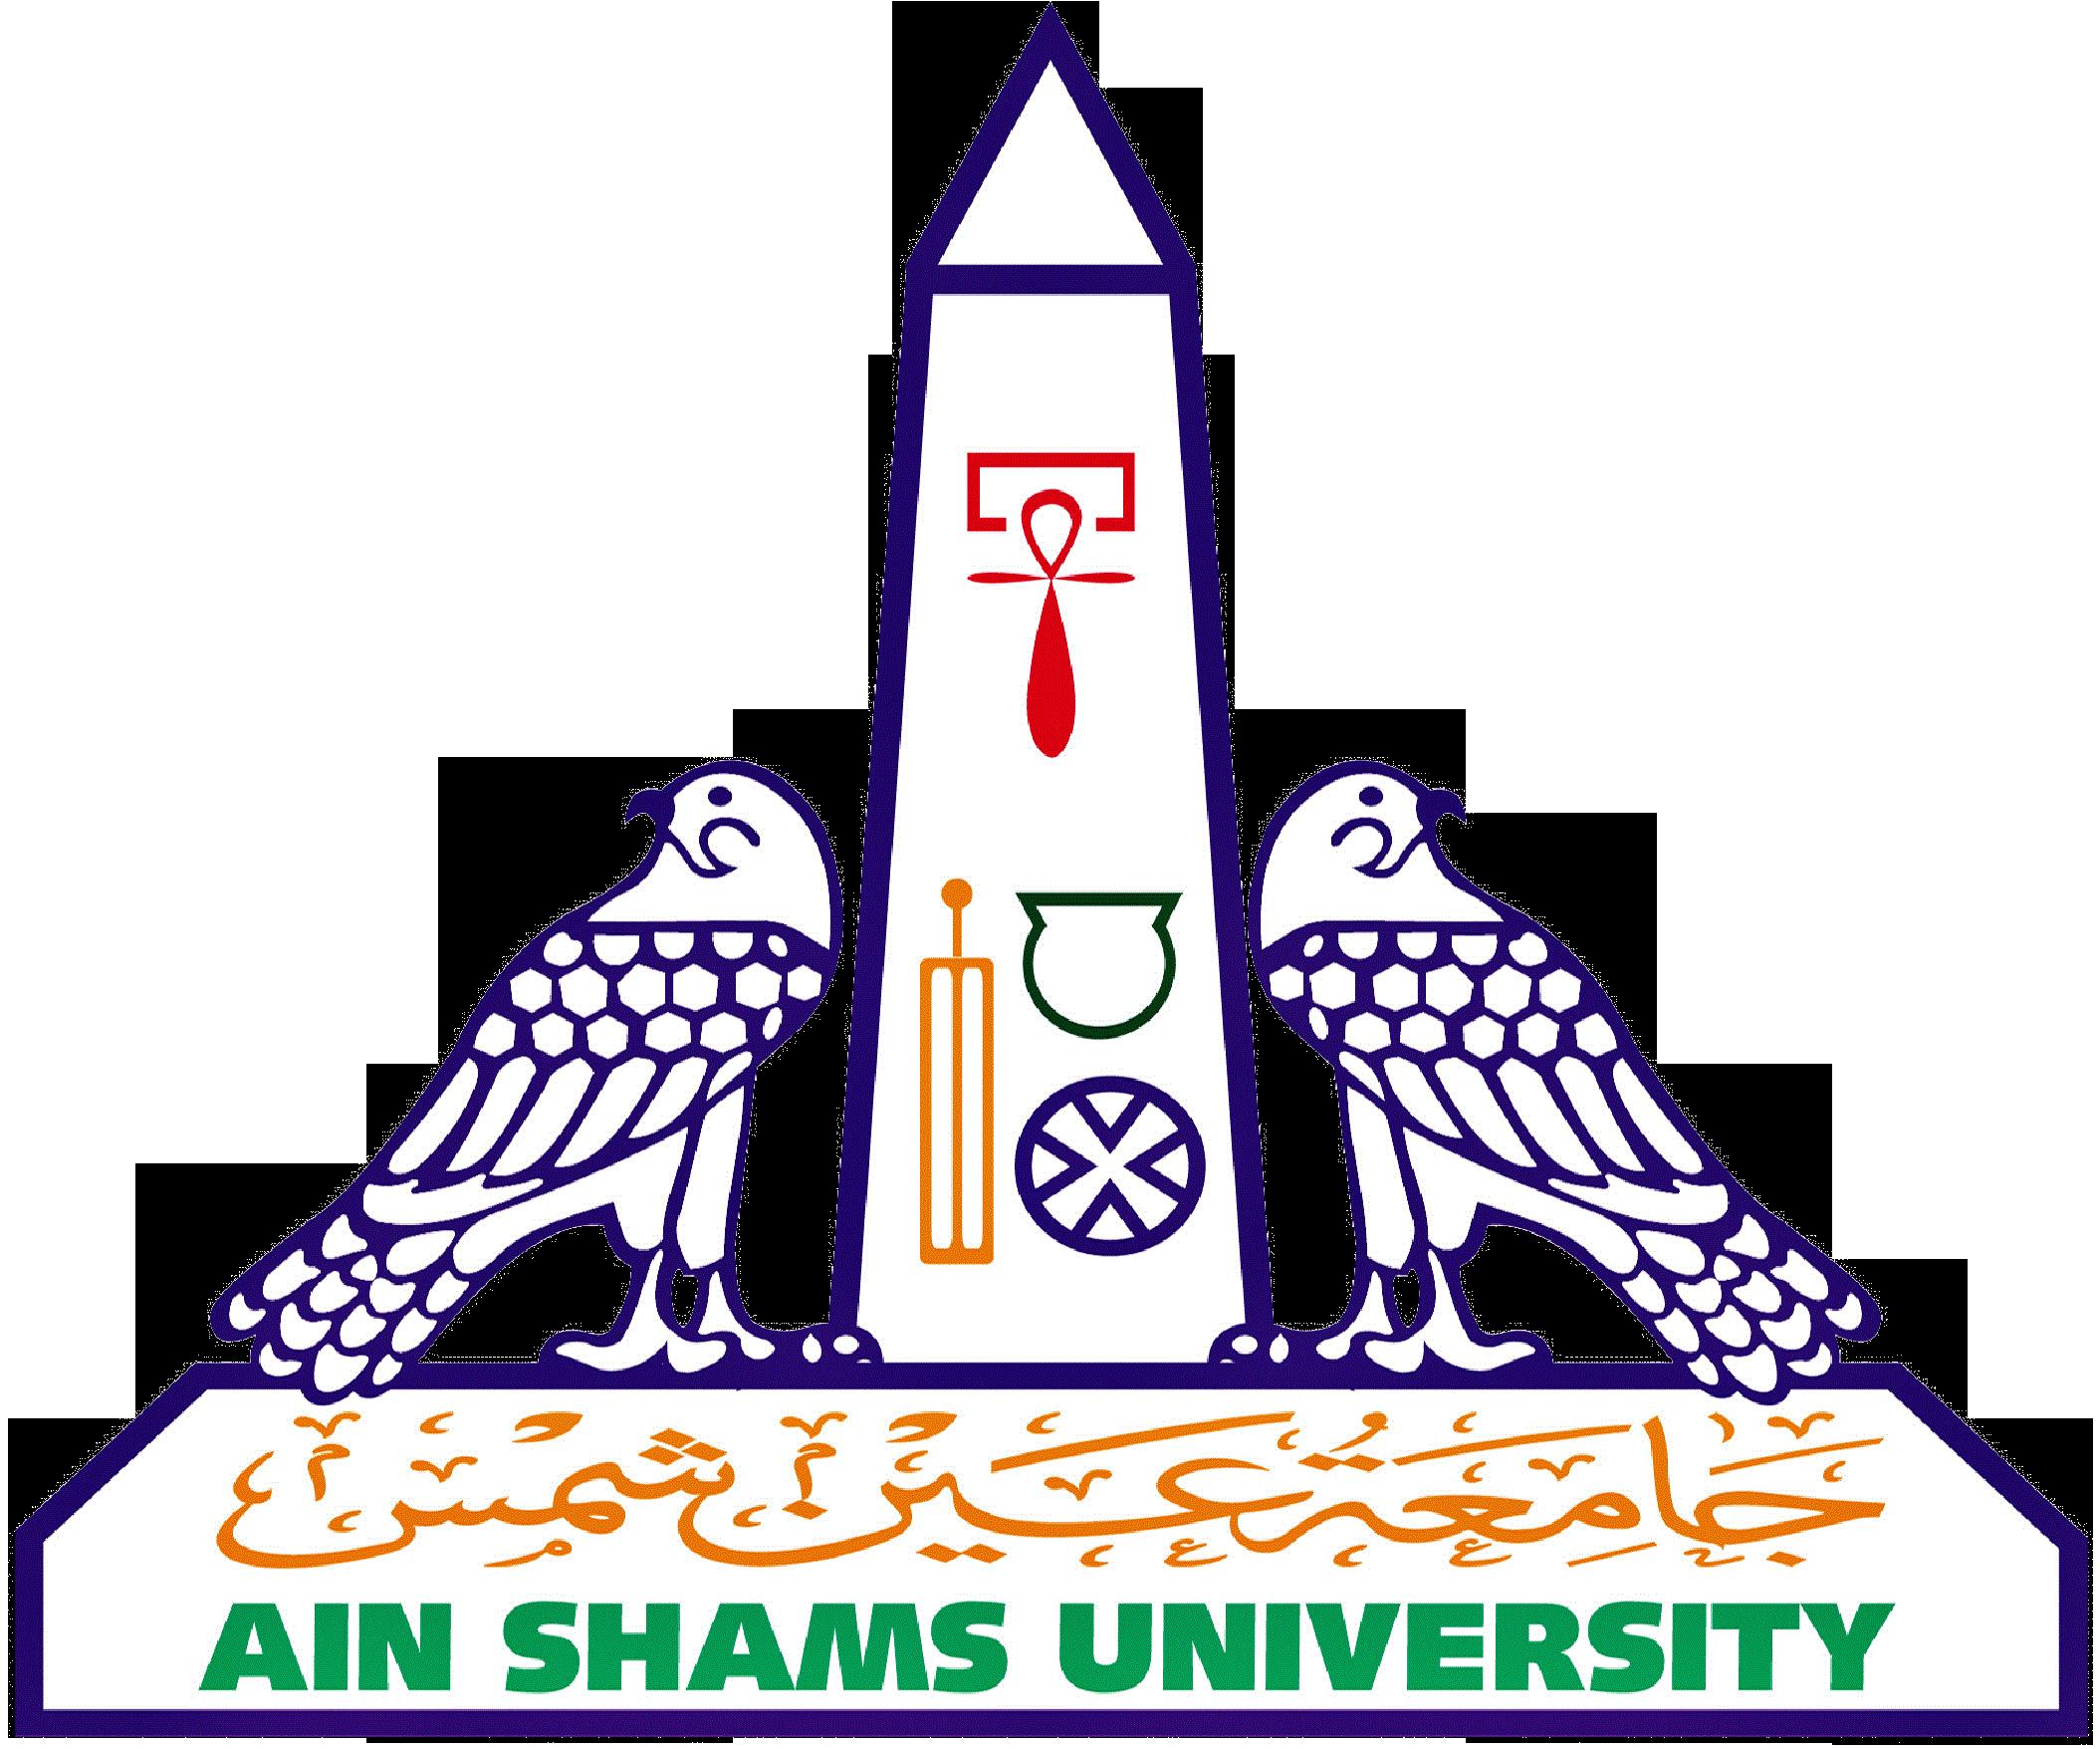 Ain-Shams